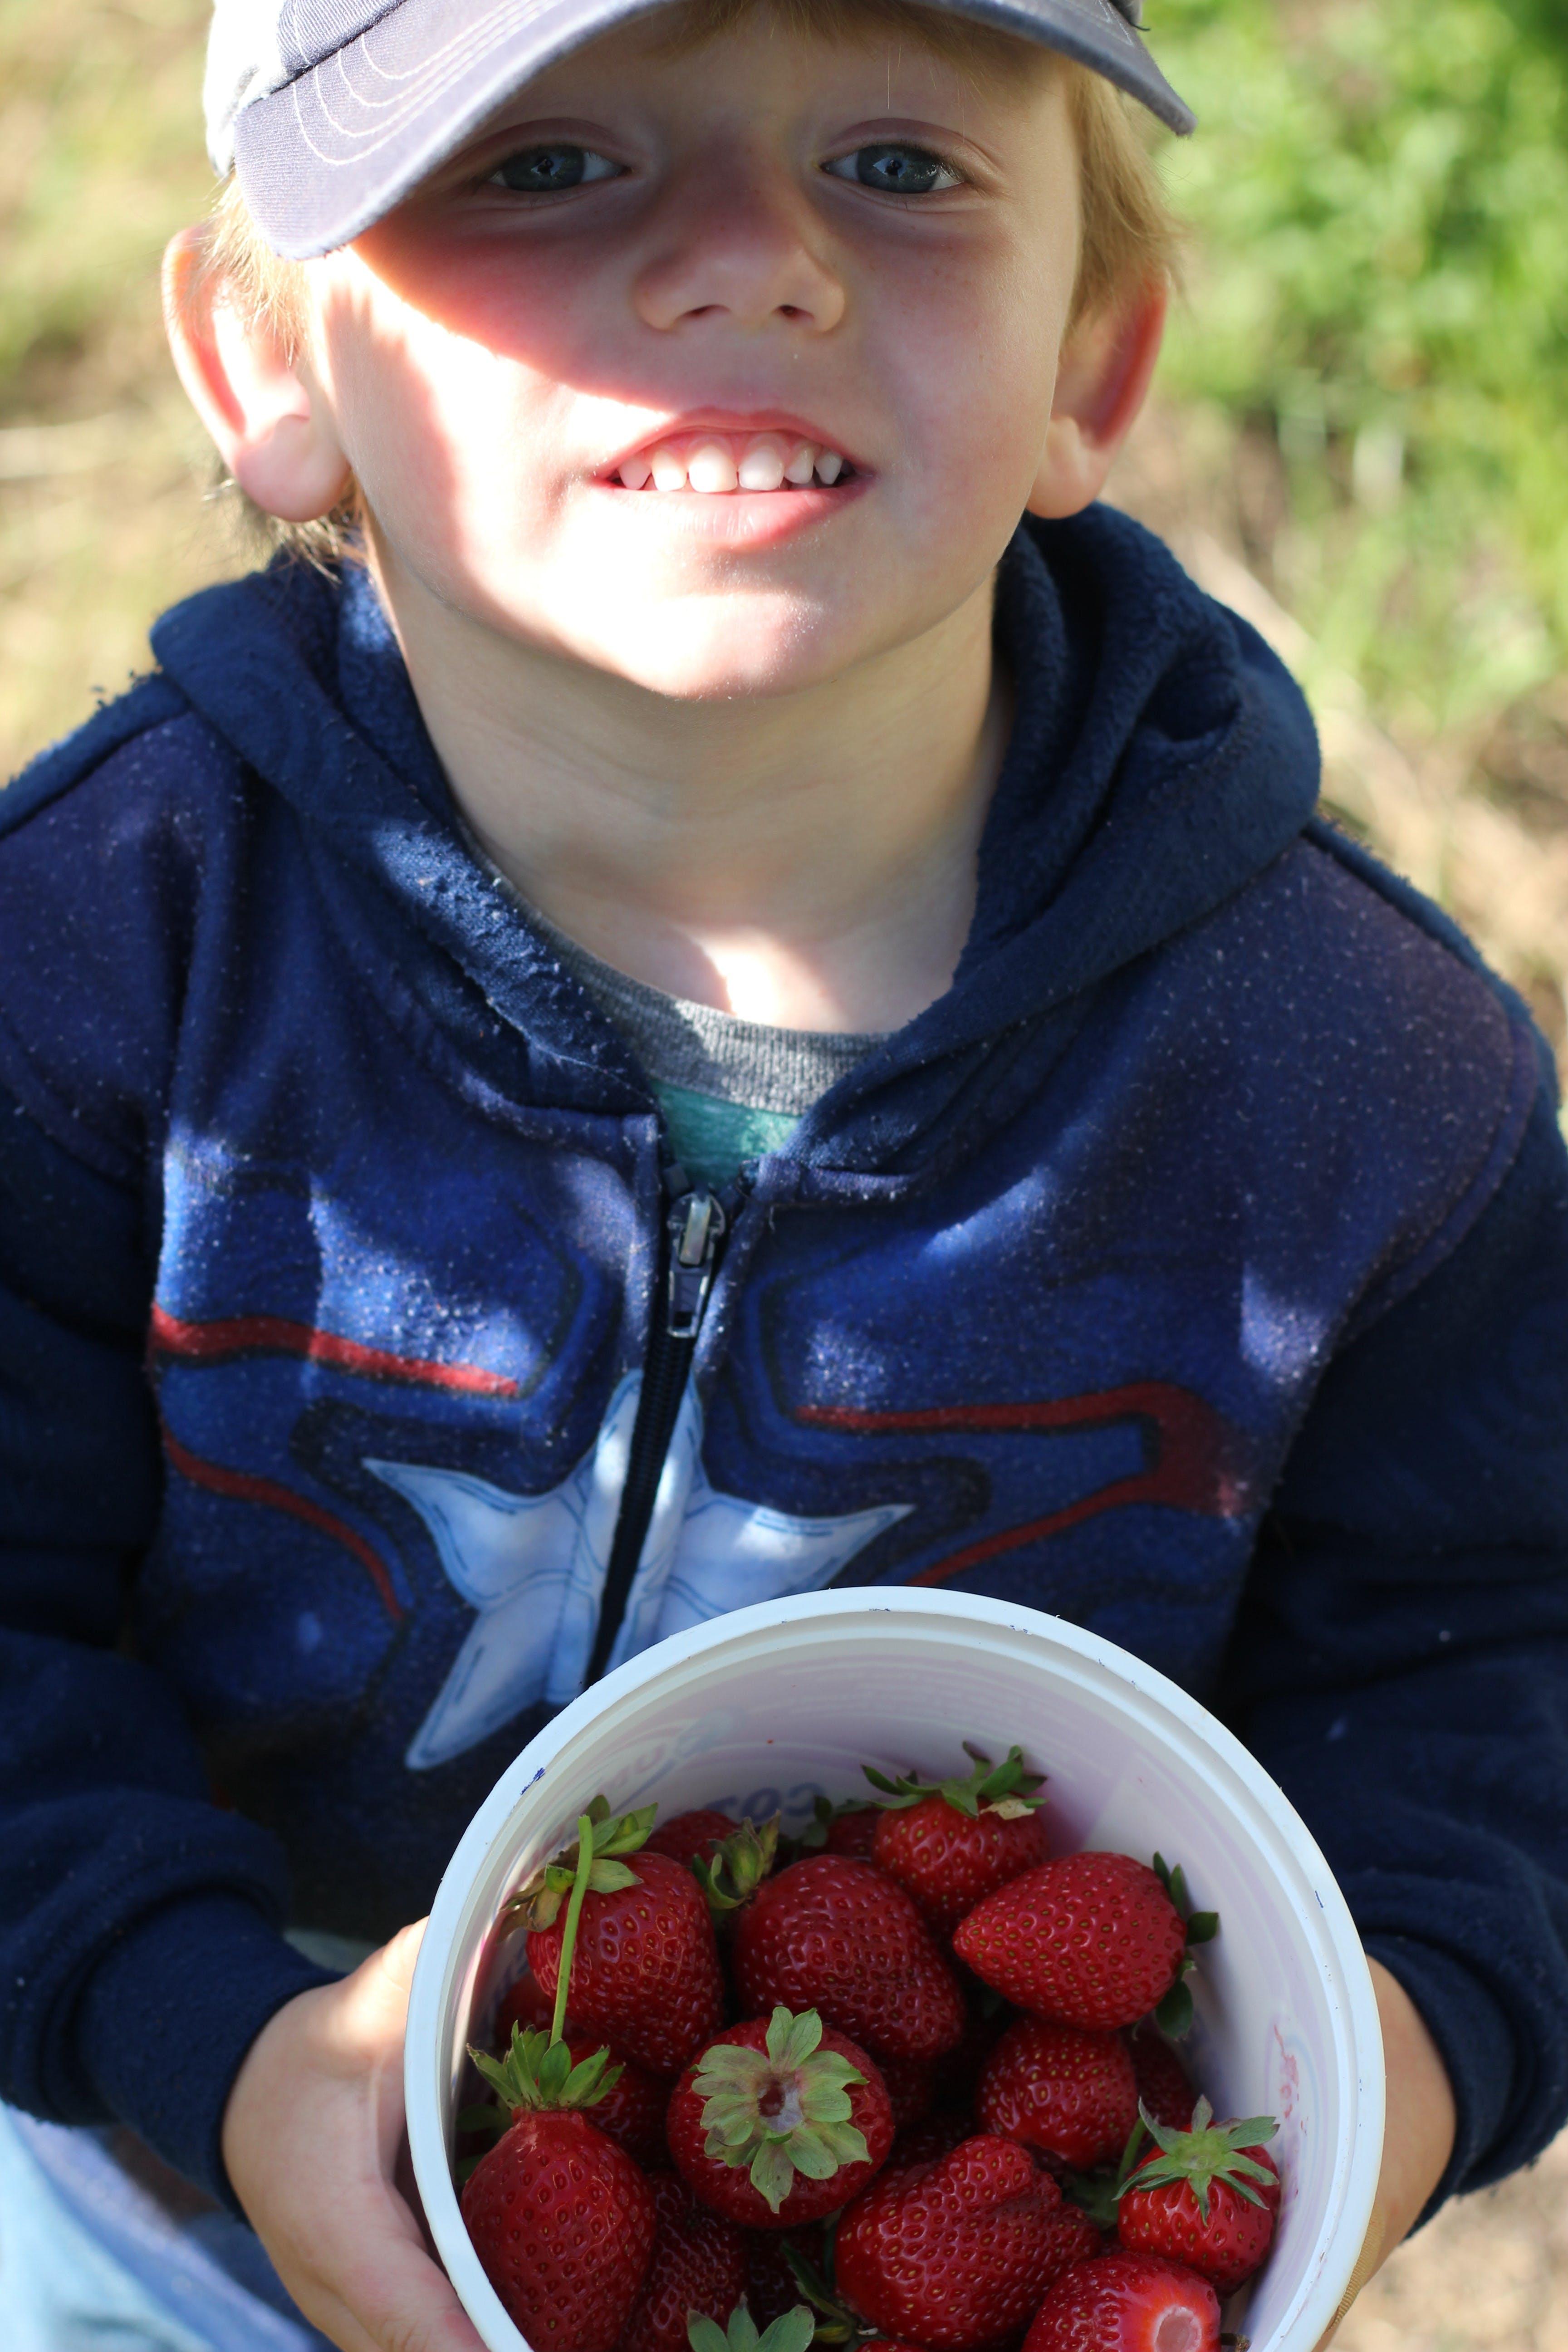 Free stock photo of boy, picking berries